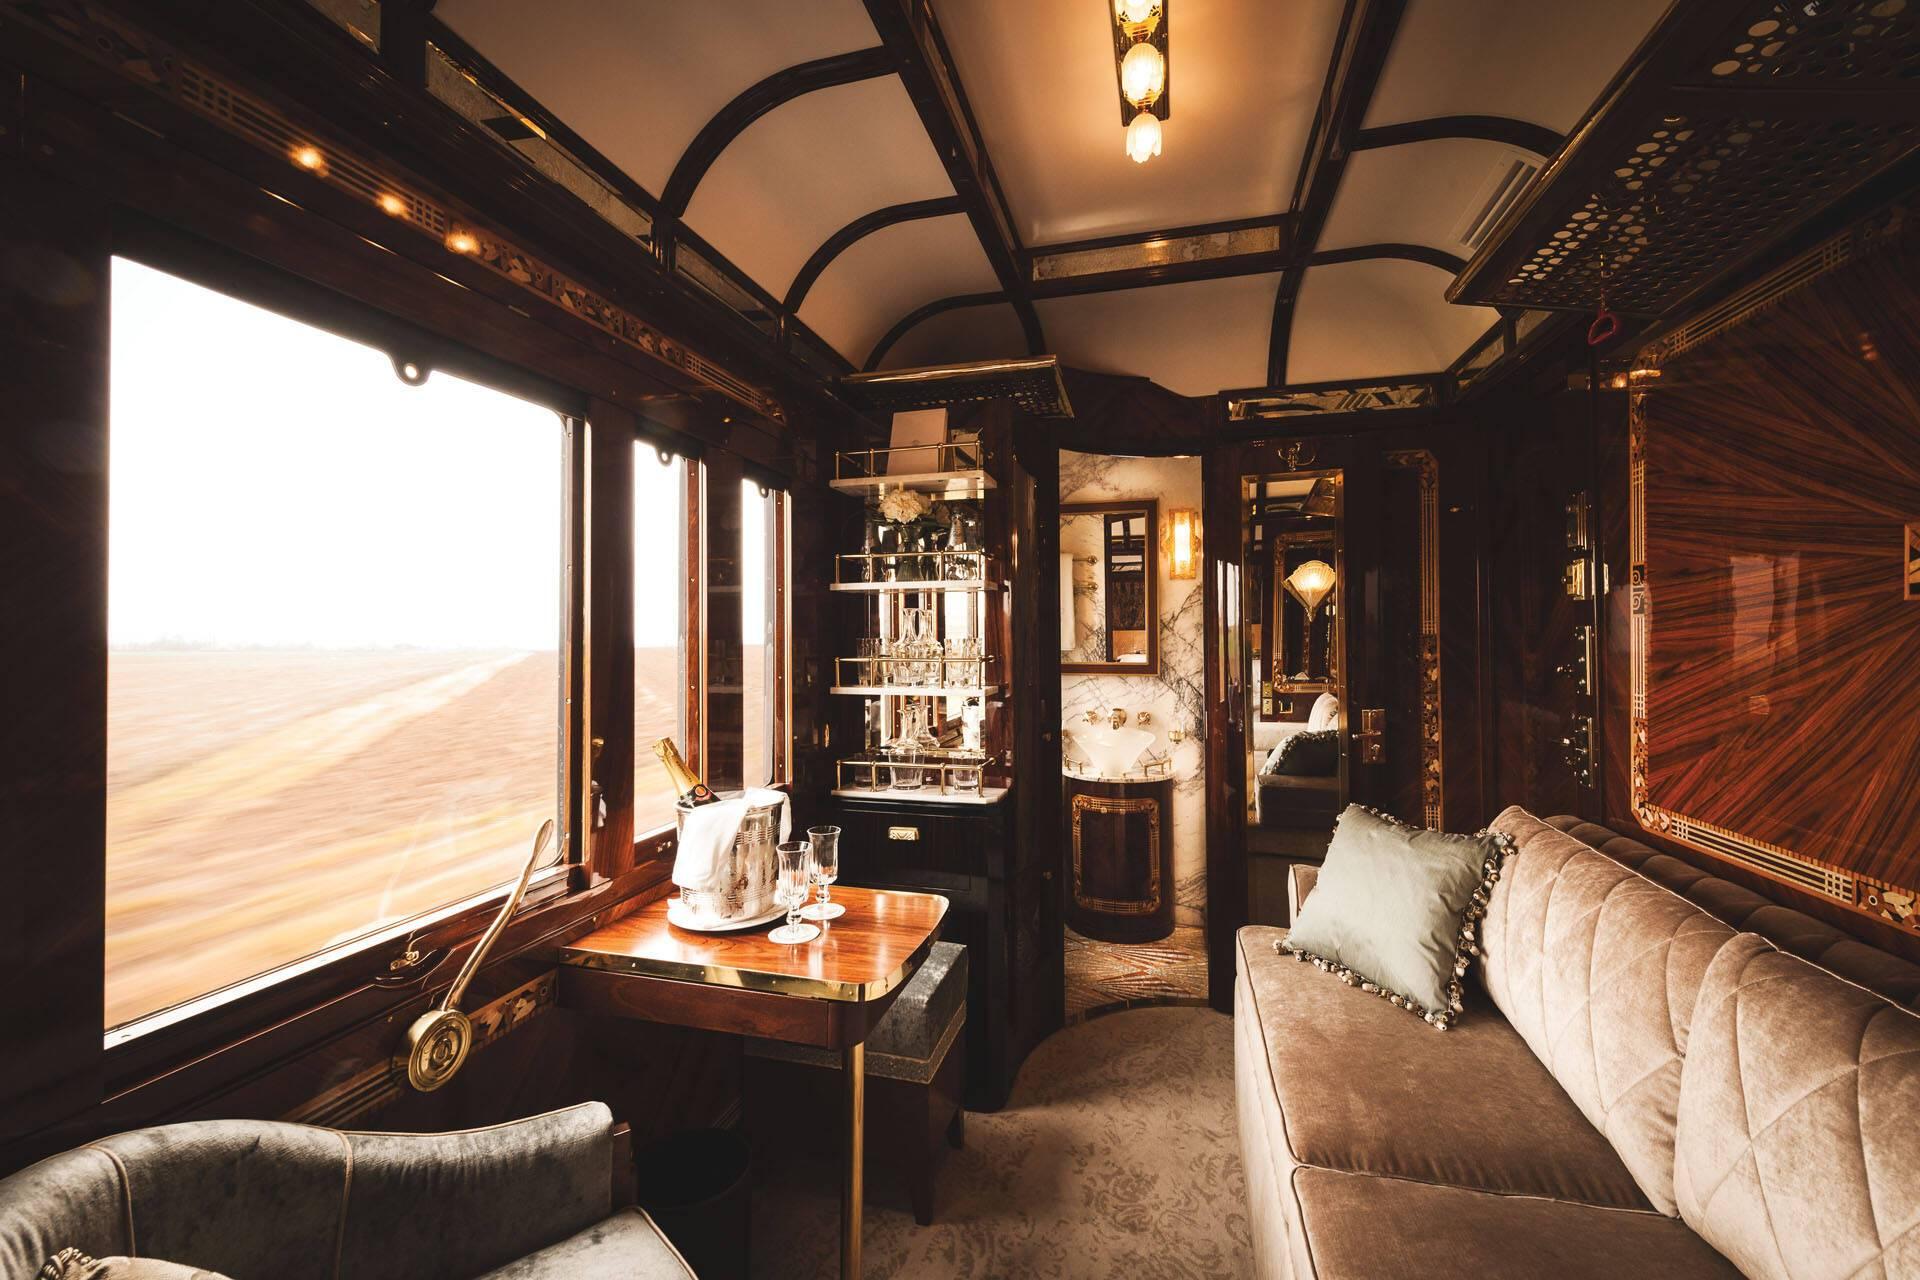 Venice Simplon Orient Express Suite5